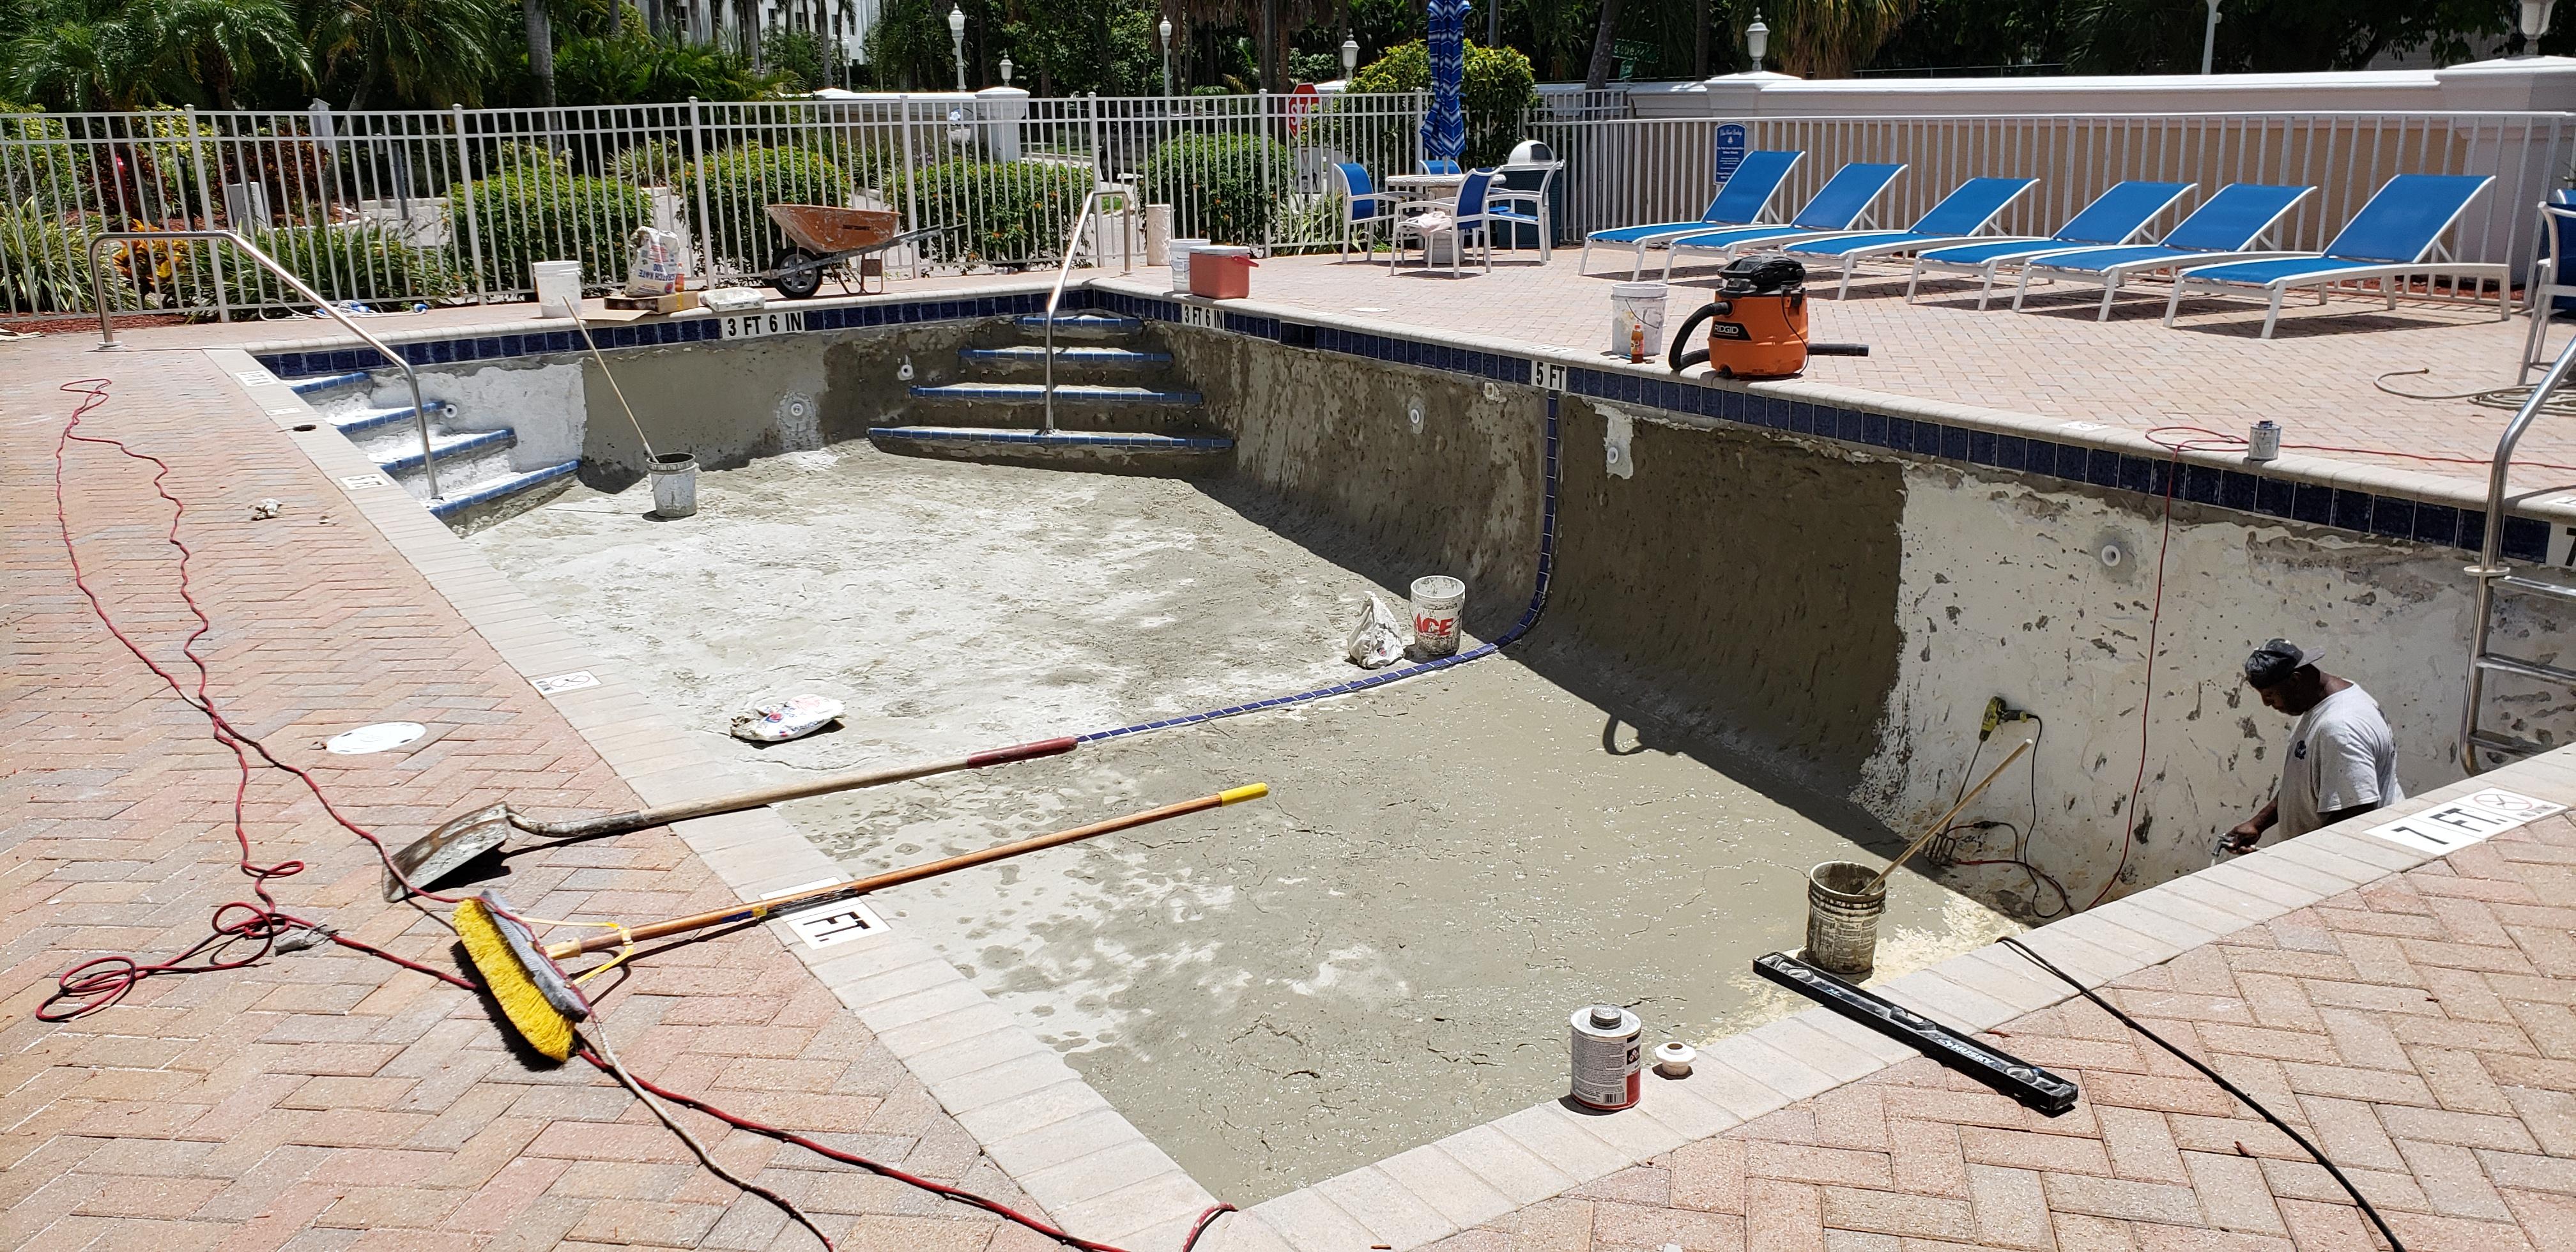 2019-07-20 Pool Resurfacing (5)